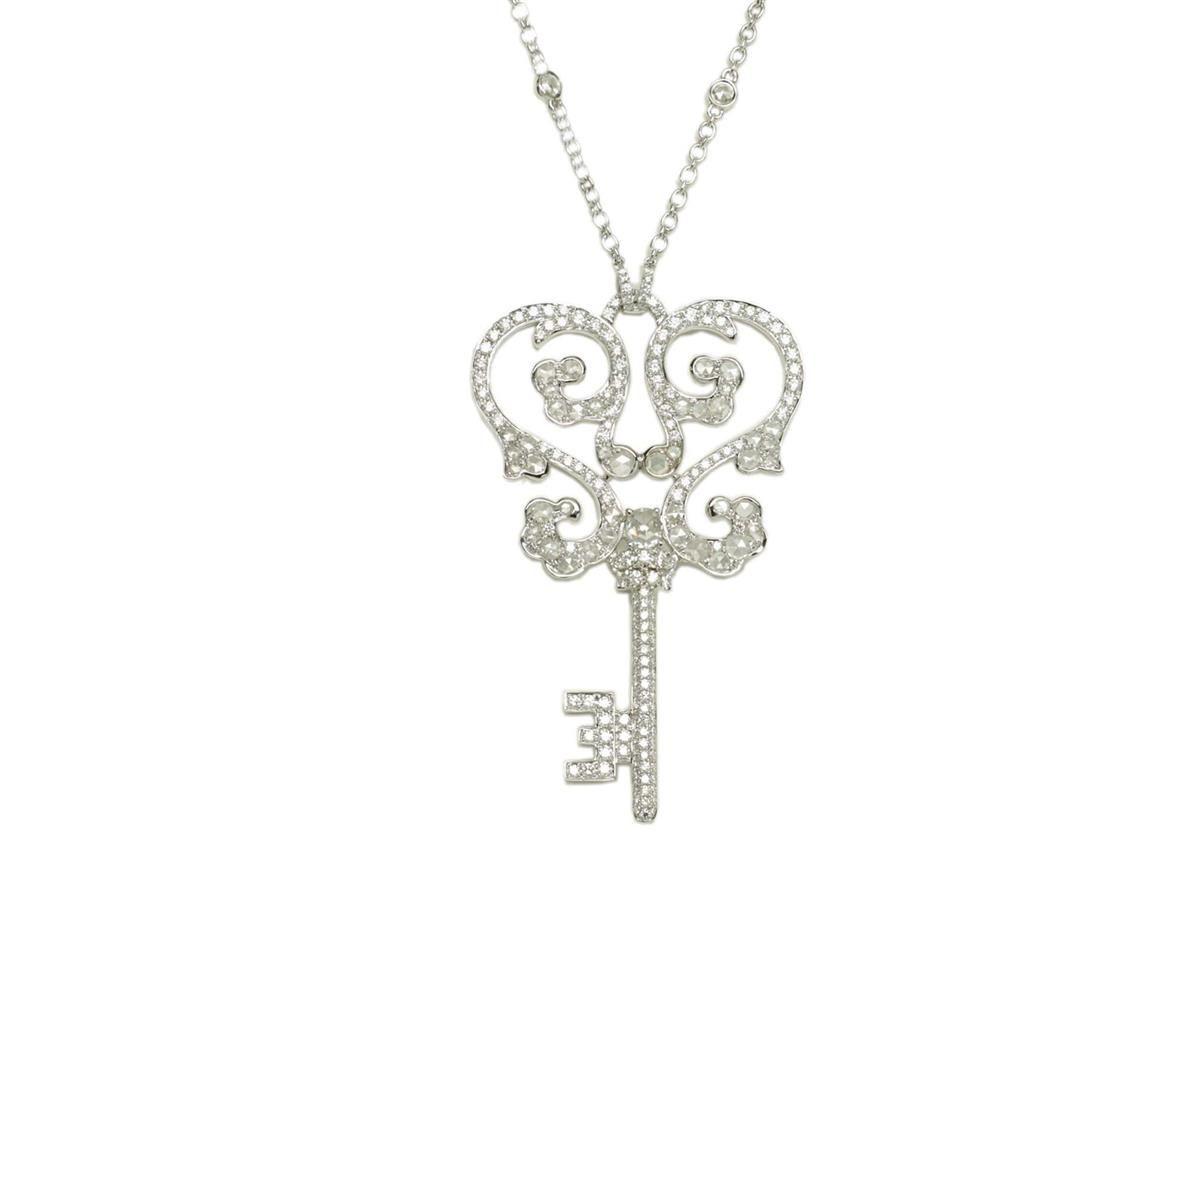 14 karat white gold and pave diamond key pendant